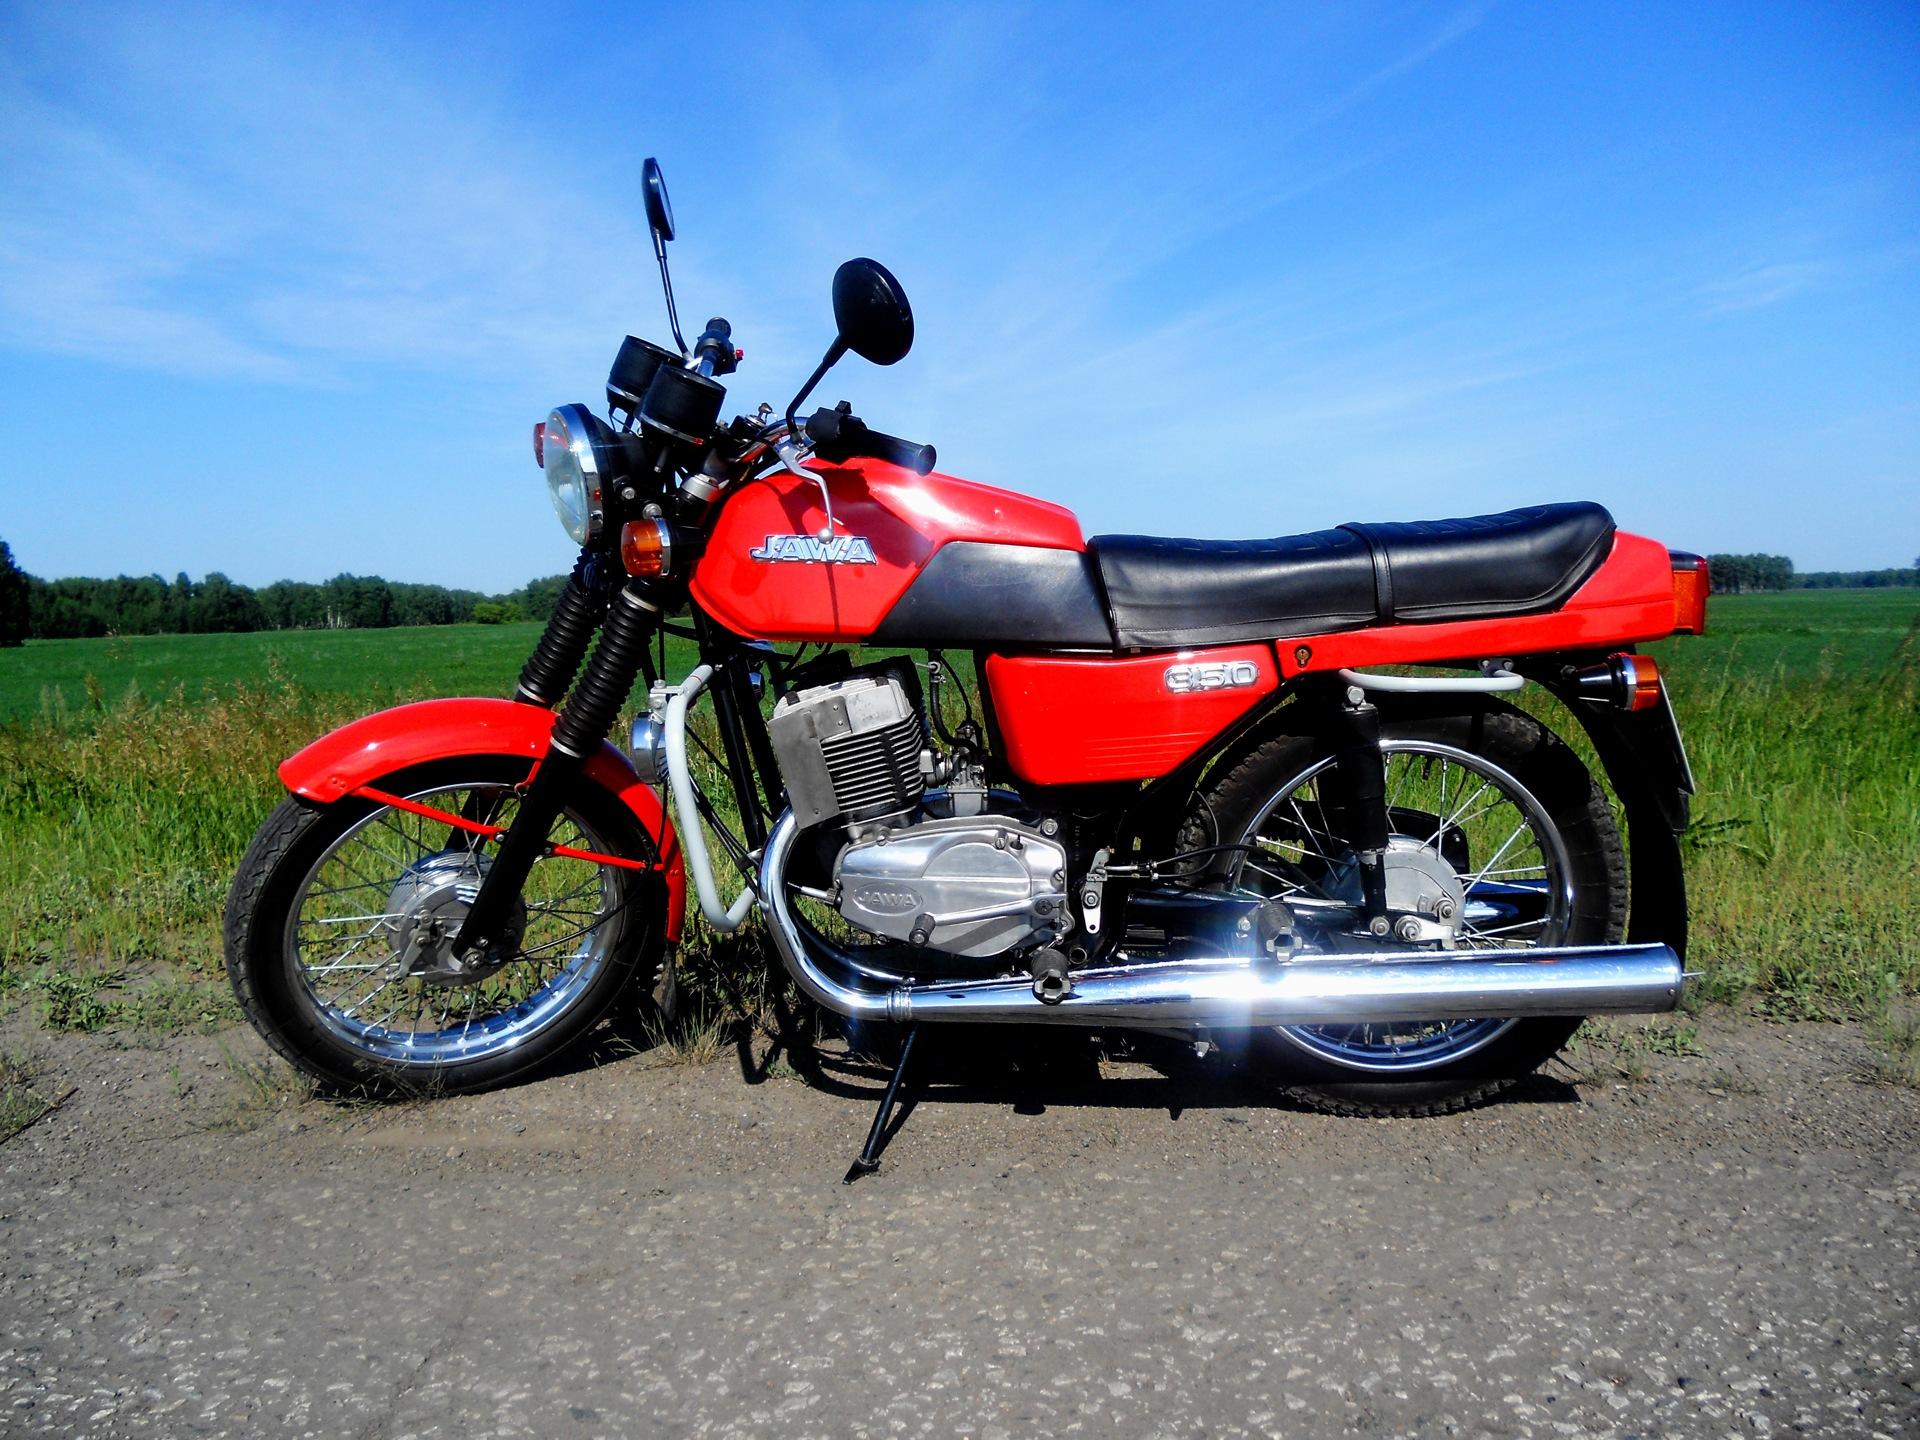 Фото № 6246 Скачати картинки мотоцикла ява